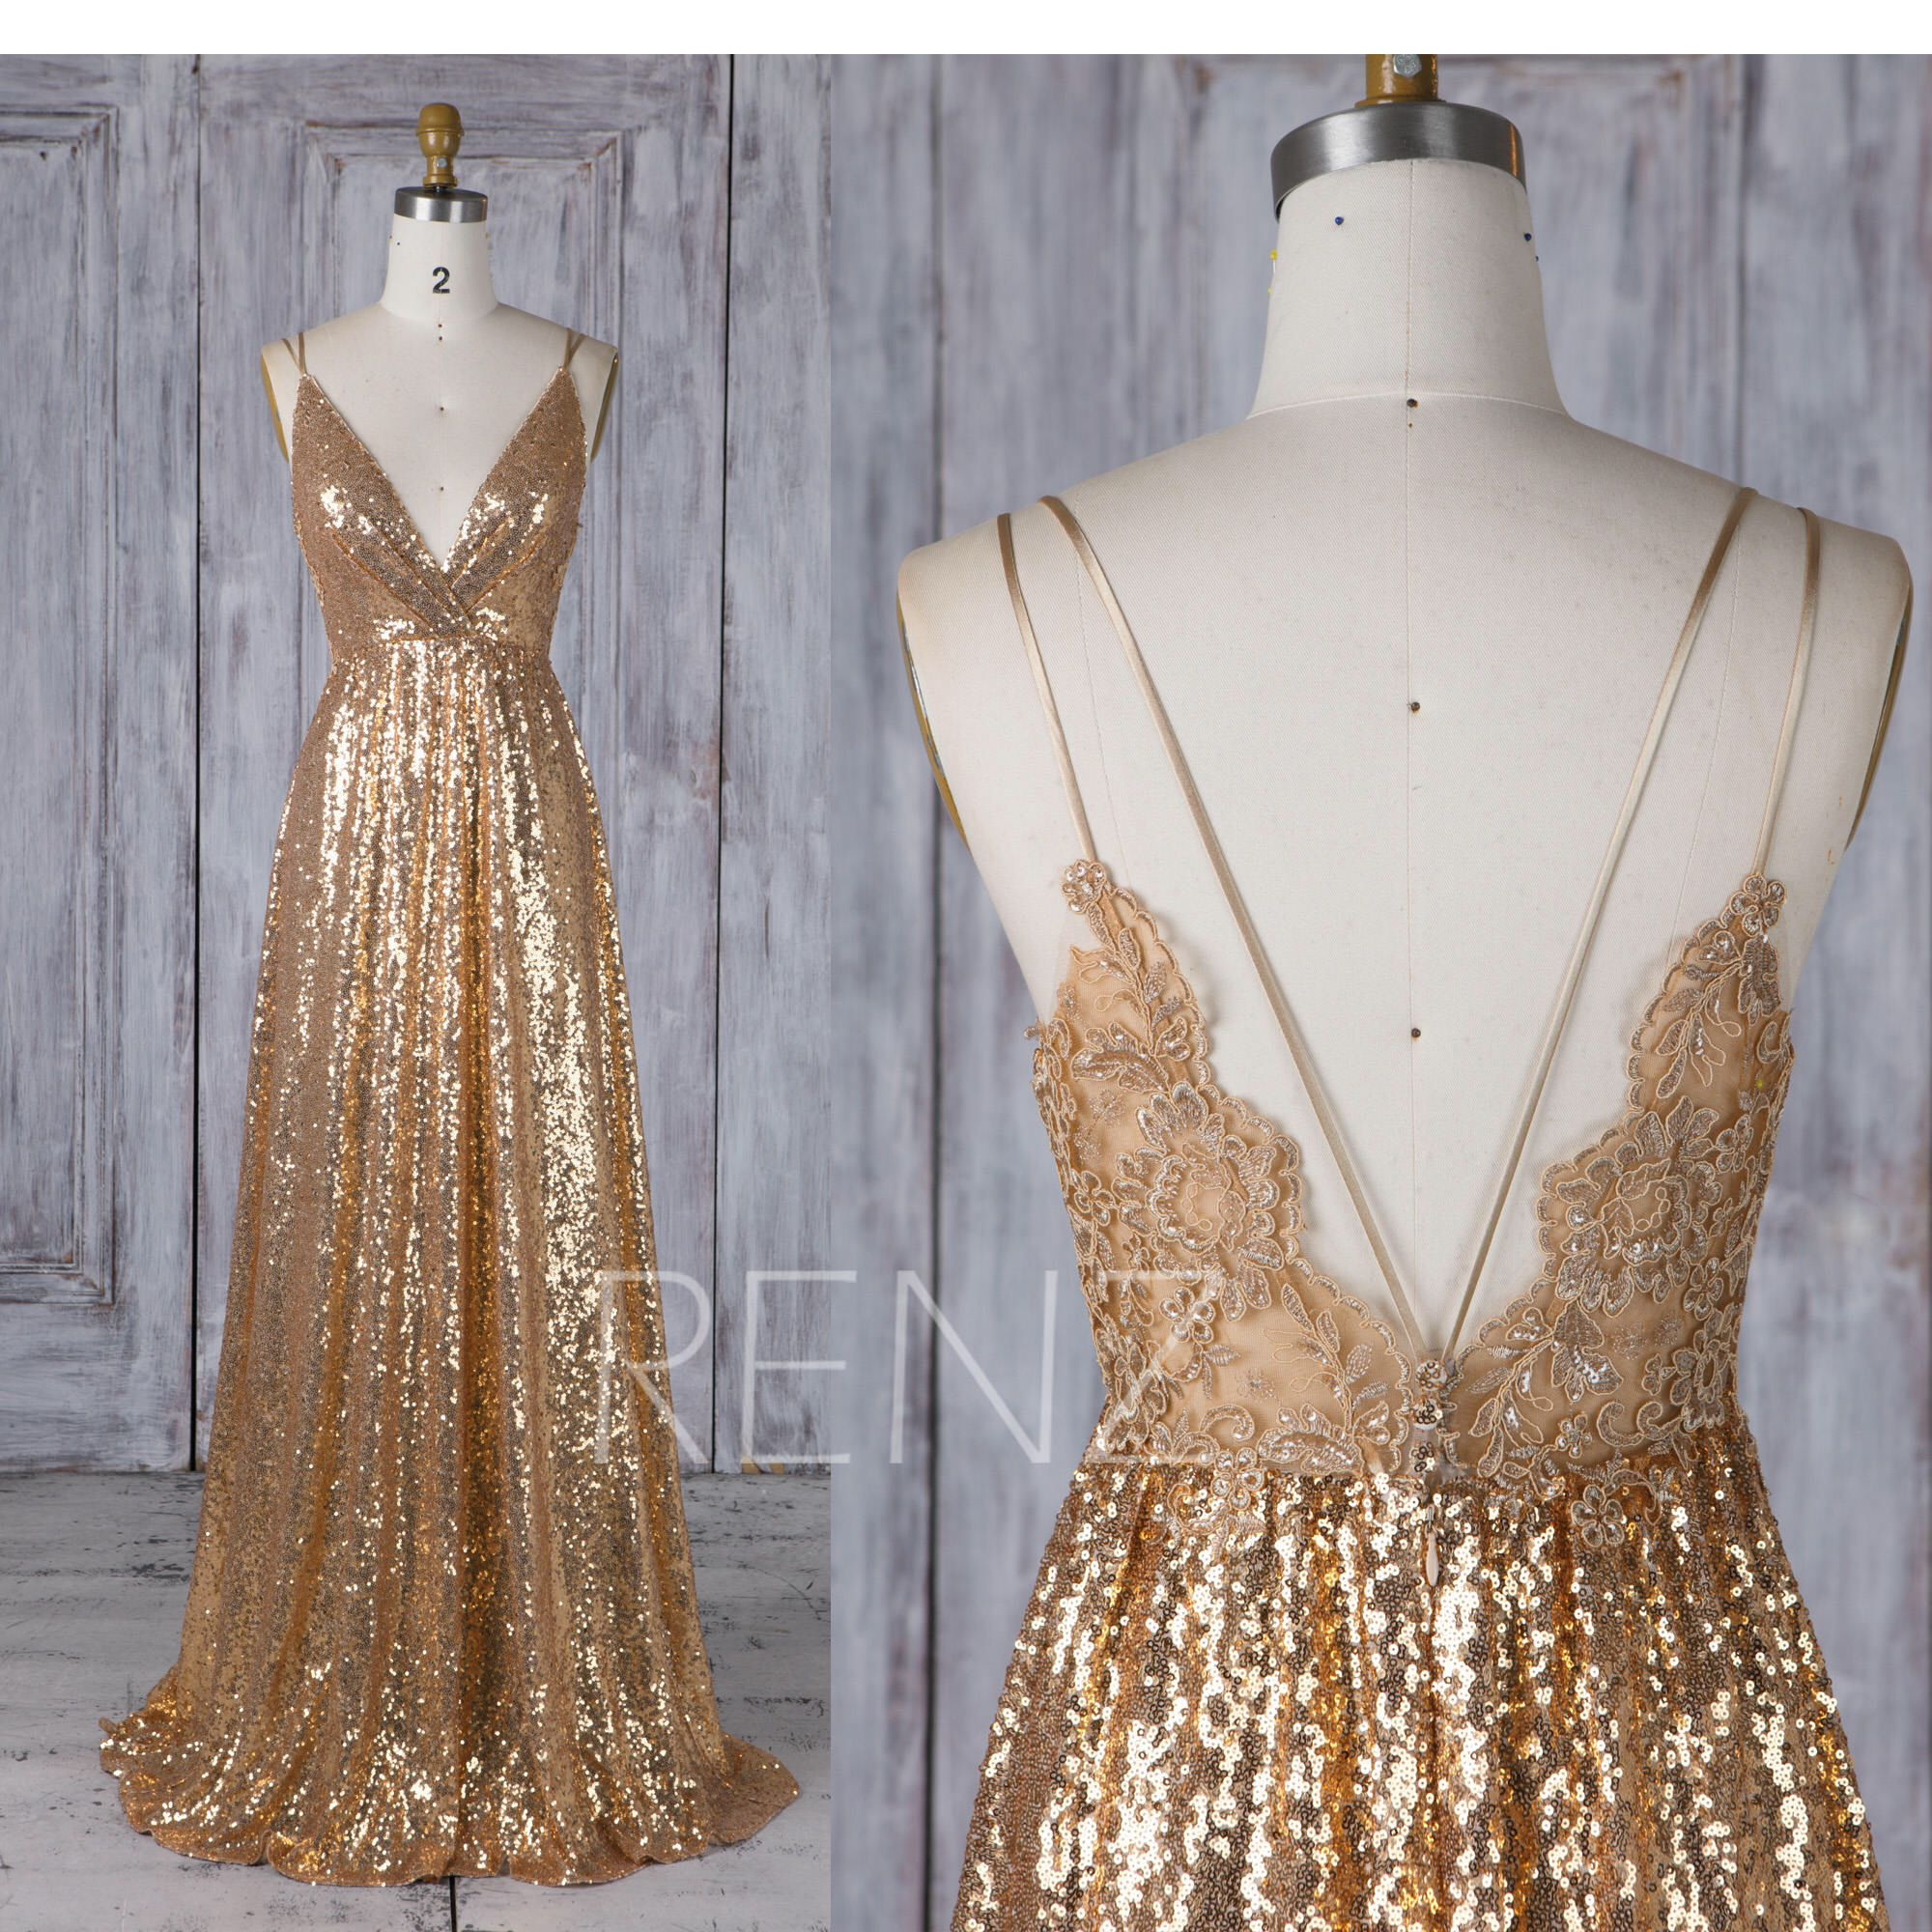 Bridesmaid Dress Gold Sequin Dress Lace Boho Wedding Dress V Neck Backless Wedding Gown (HQ580)